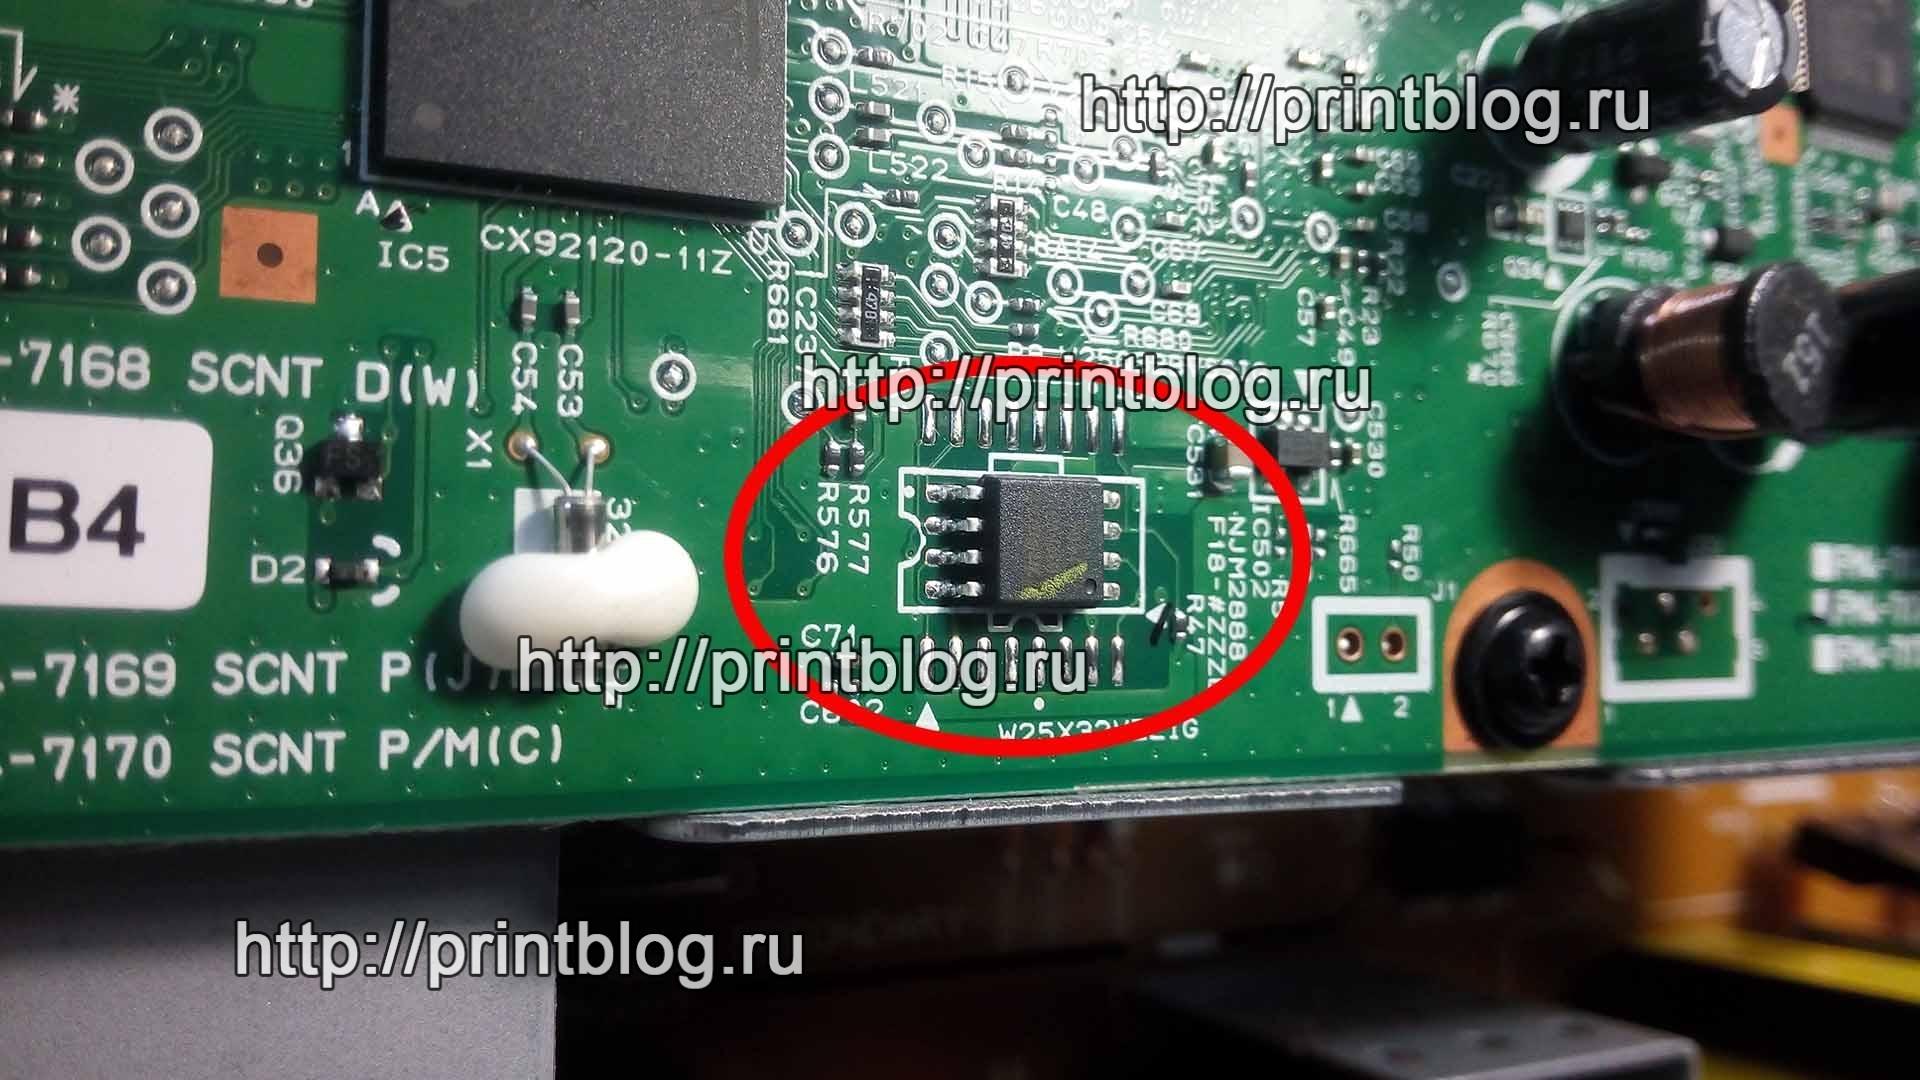 Canon i-sensys mf4410 printer driver download.